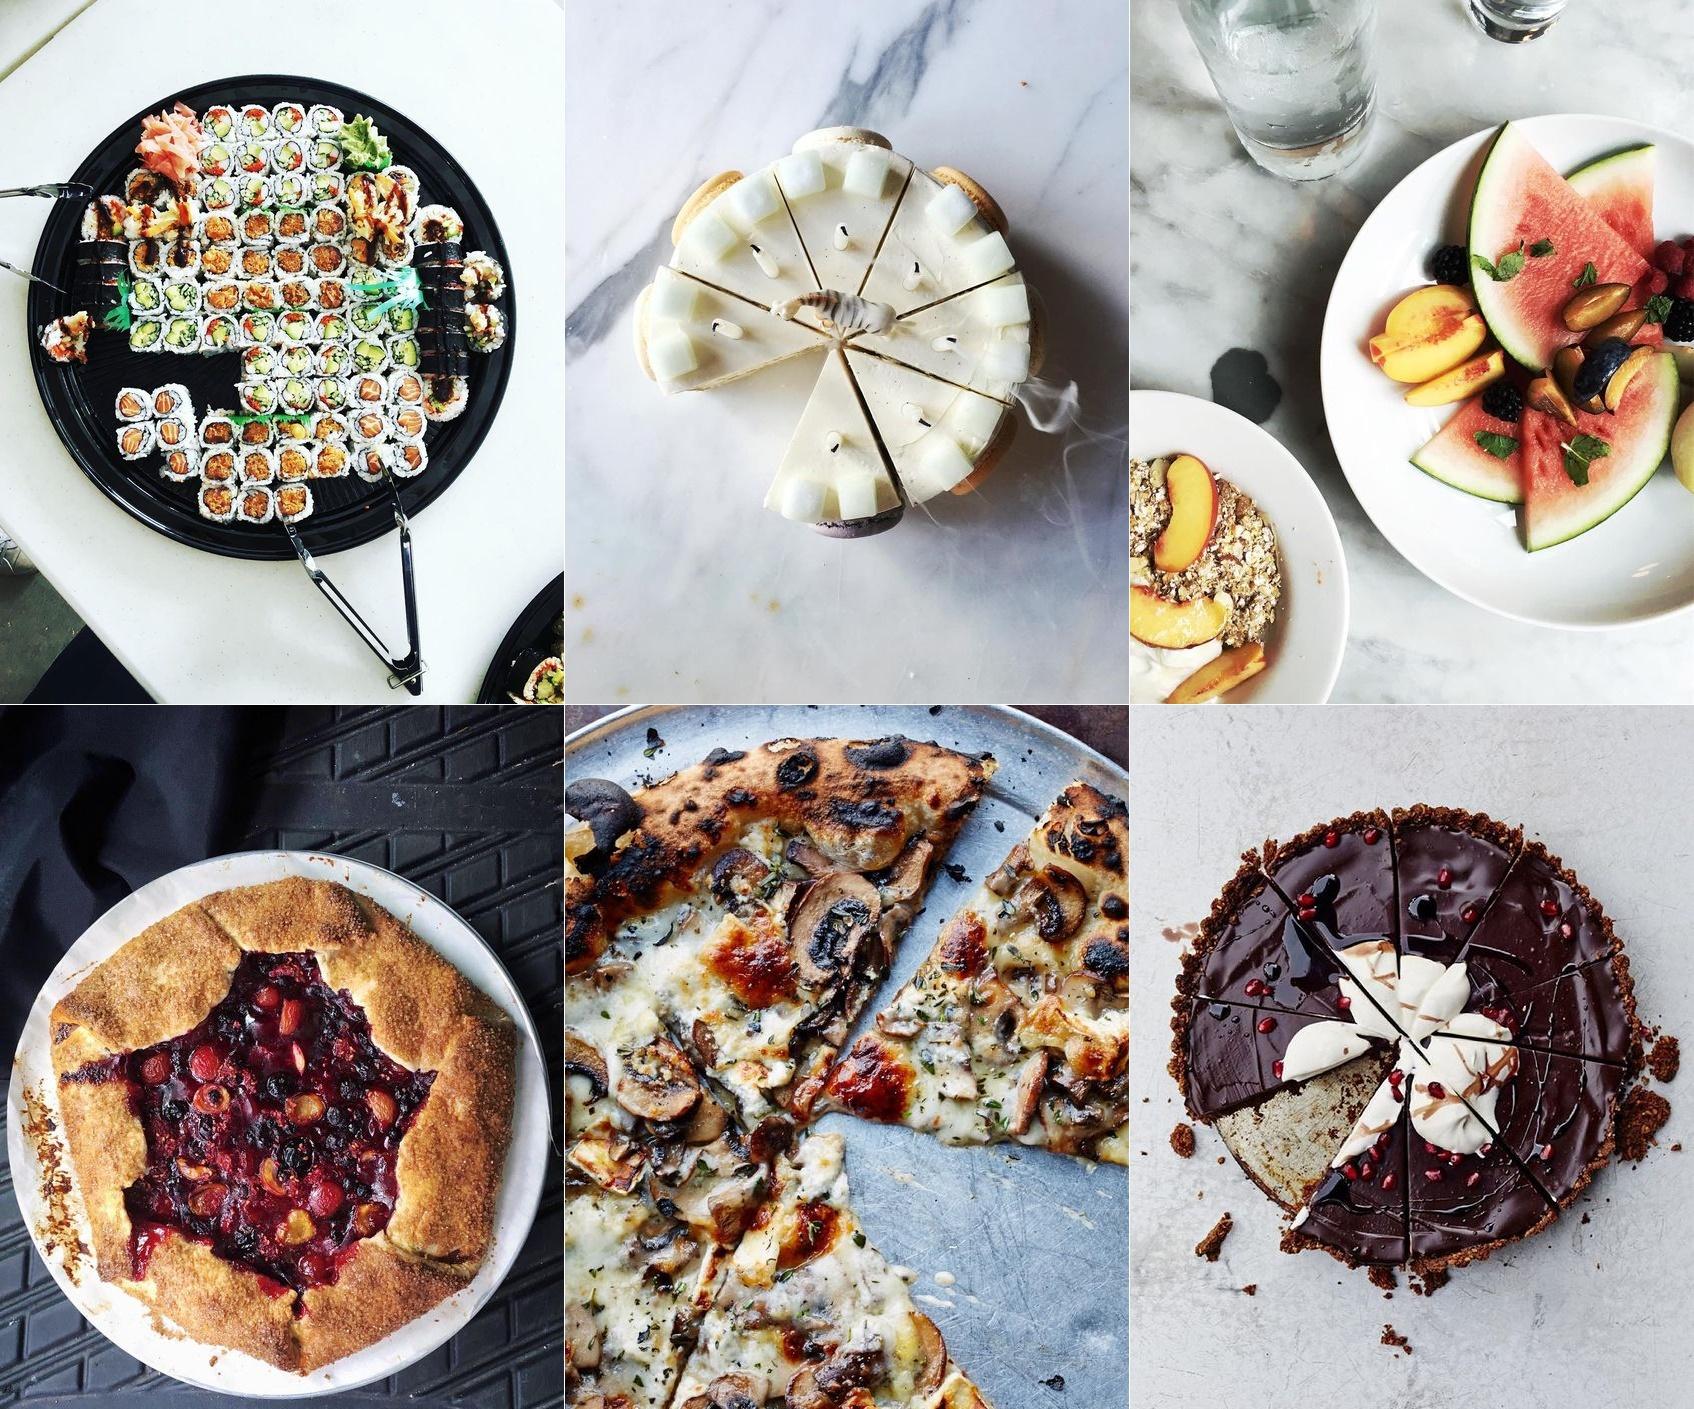 instagram-comidas-gastronomia-nikoleherriott